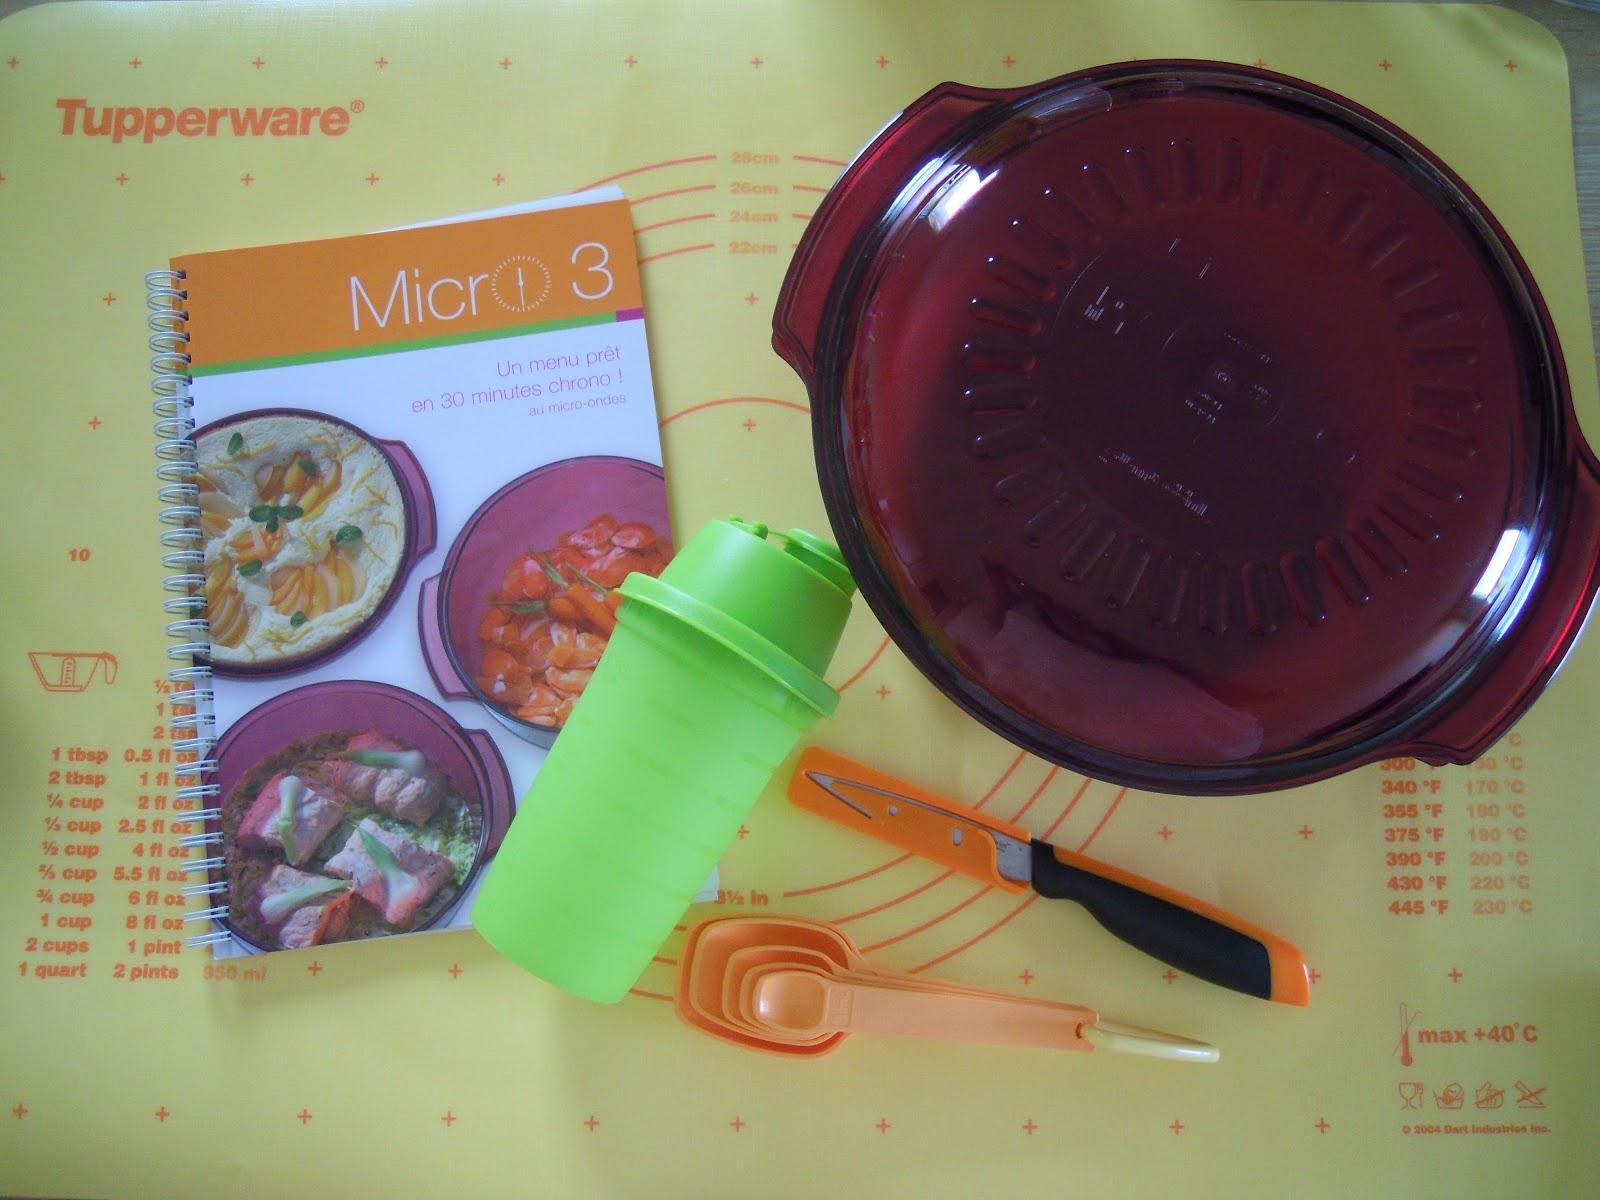 Am lie gourmandises tupperware courgettes au curry au micro ondes - Plat micro onde tupperware ...